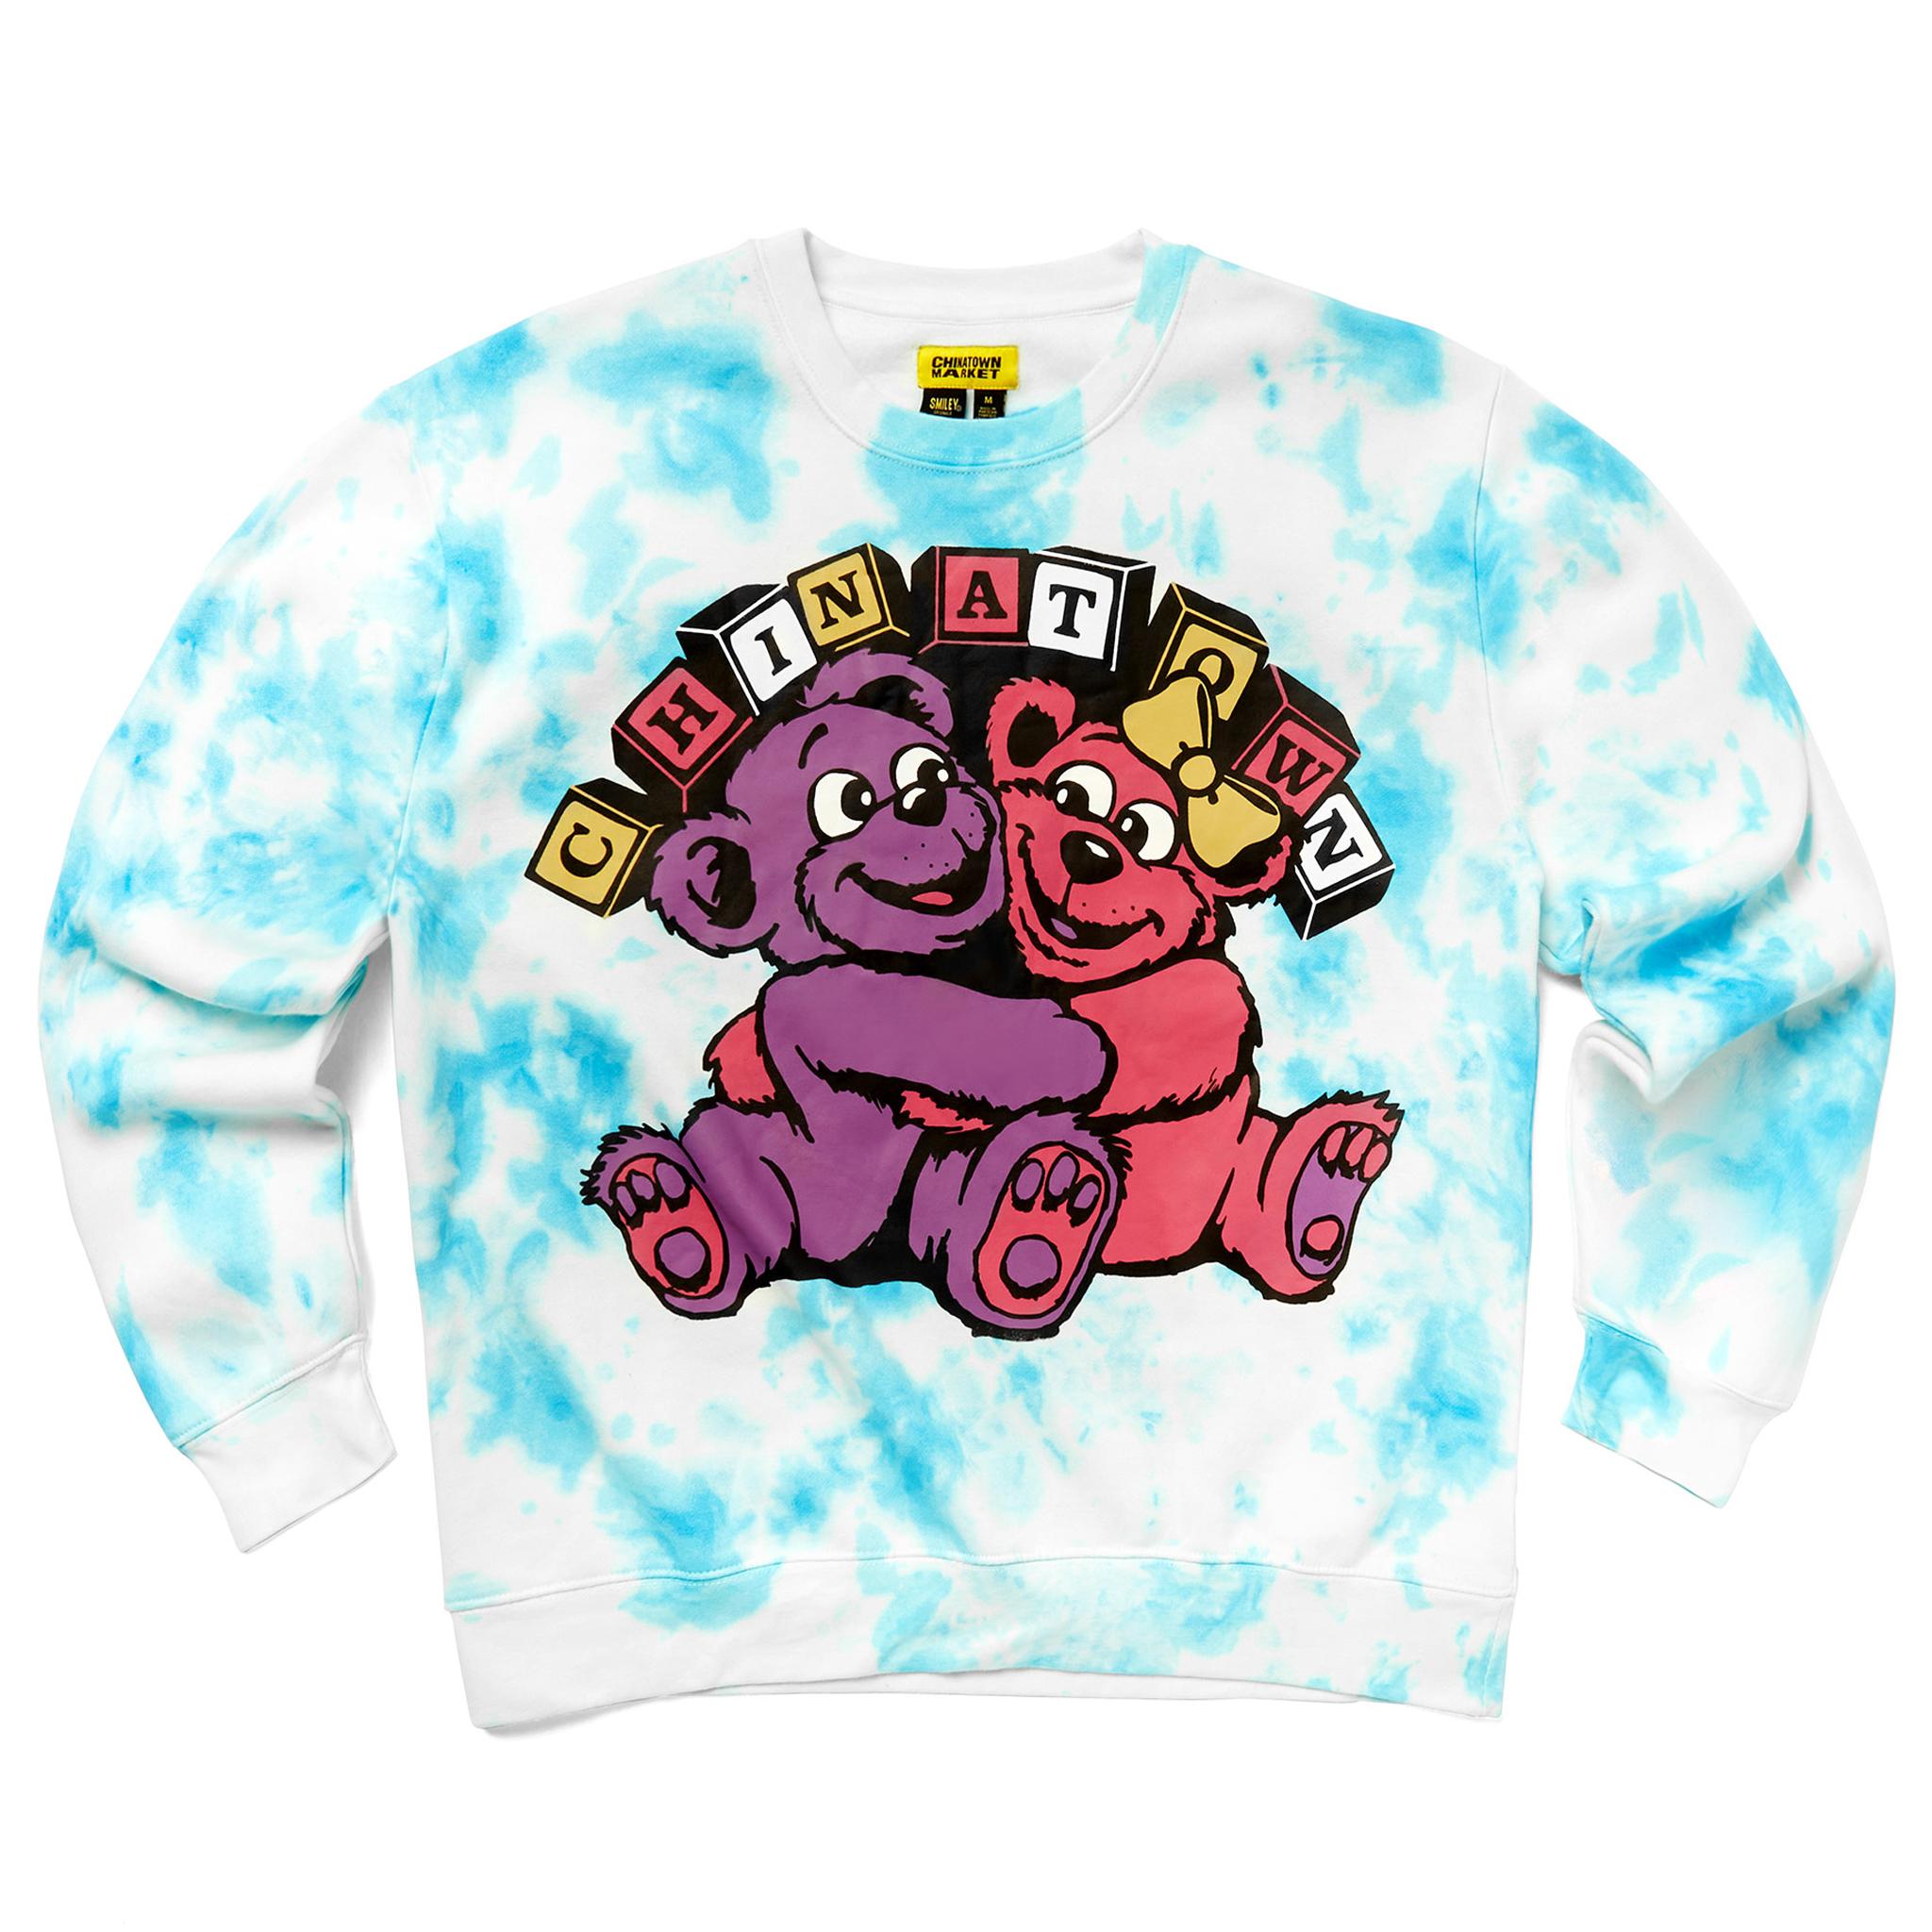 China Town Market Hypercute Sweatshirt